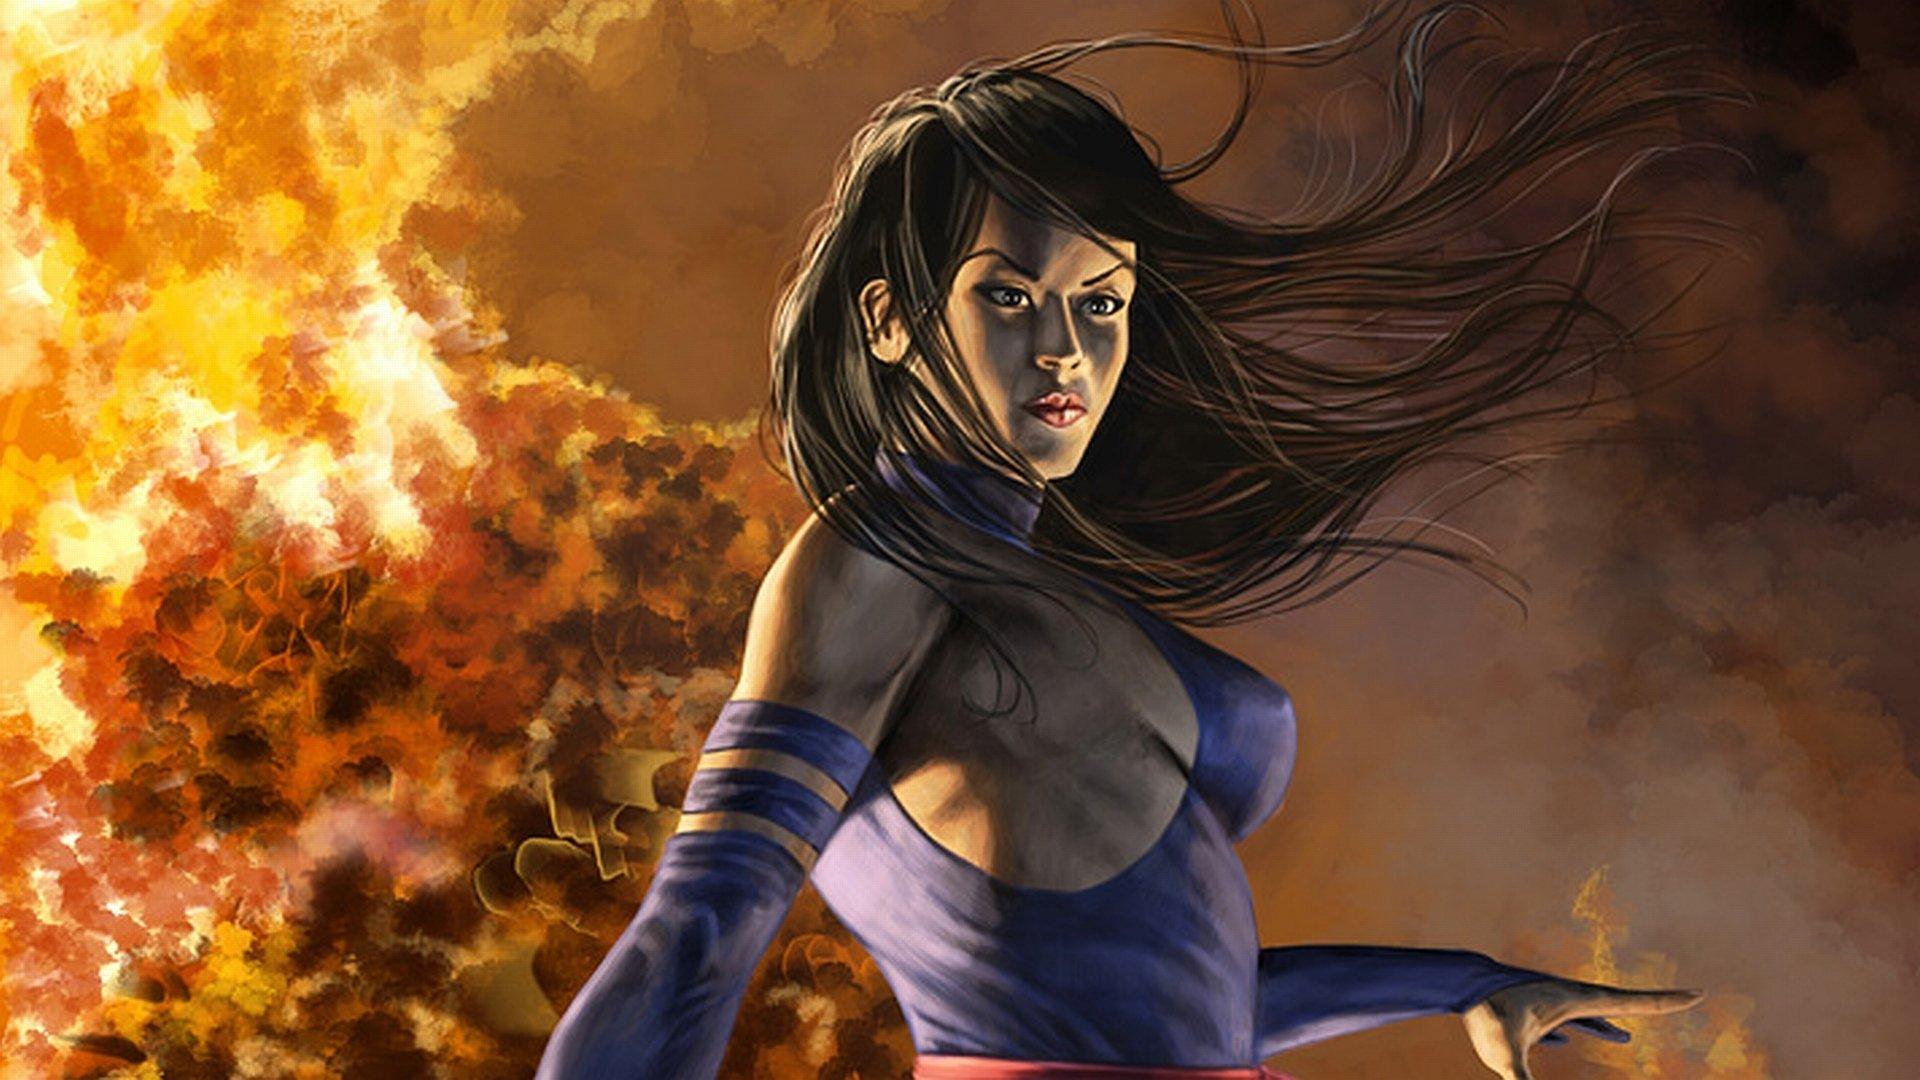 Comics - Psylocke  Wallpaper